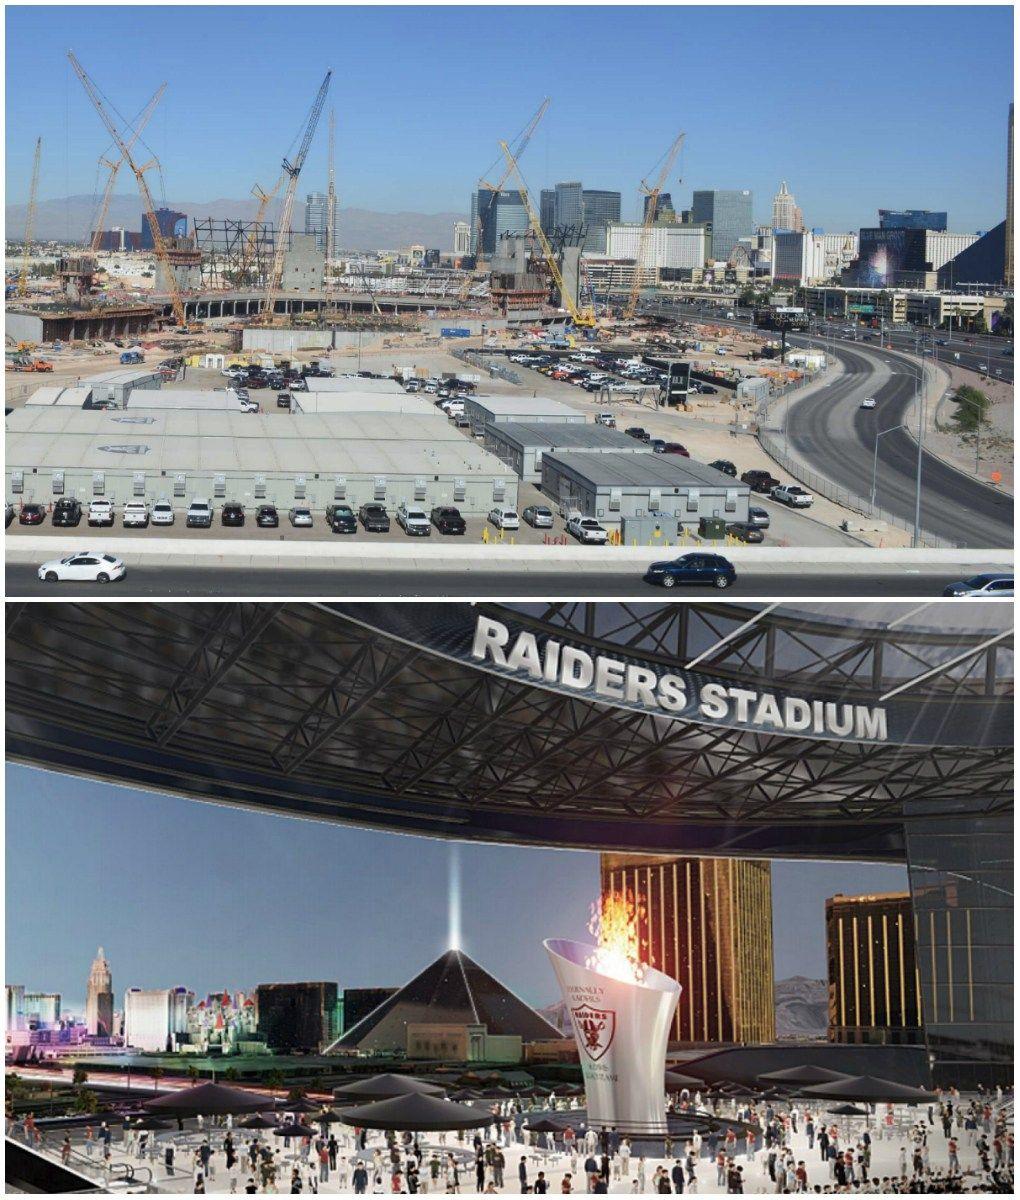 Nevada Regulators to Consider Gambling Inside Las Vegas